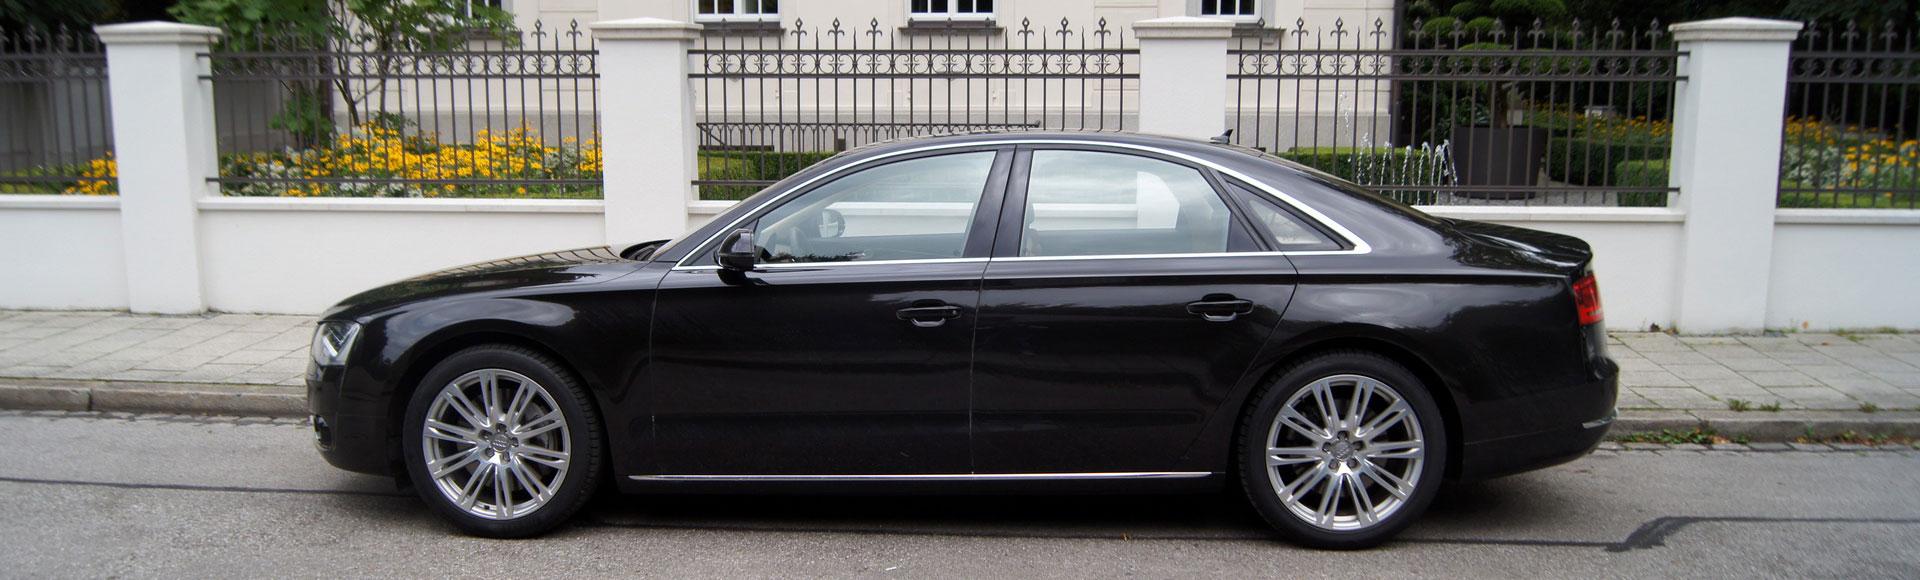 Audi A8 2011 Sommer 8515